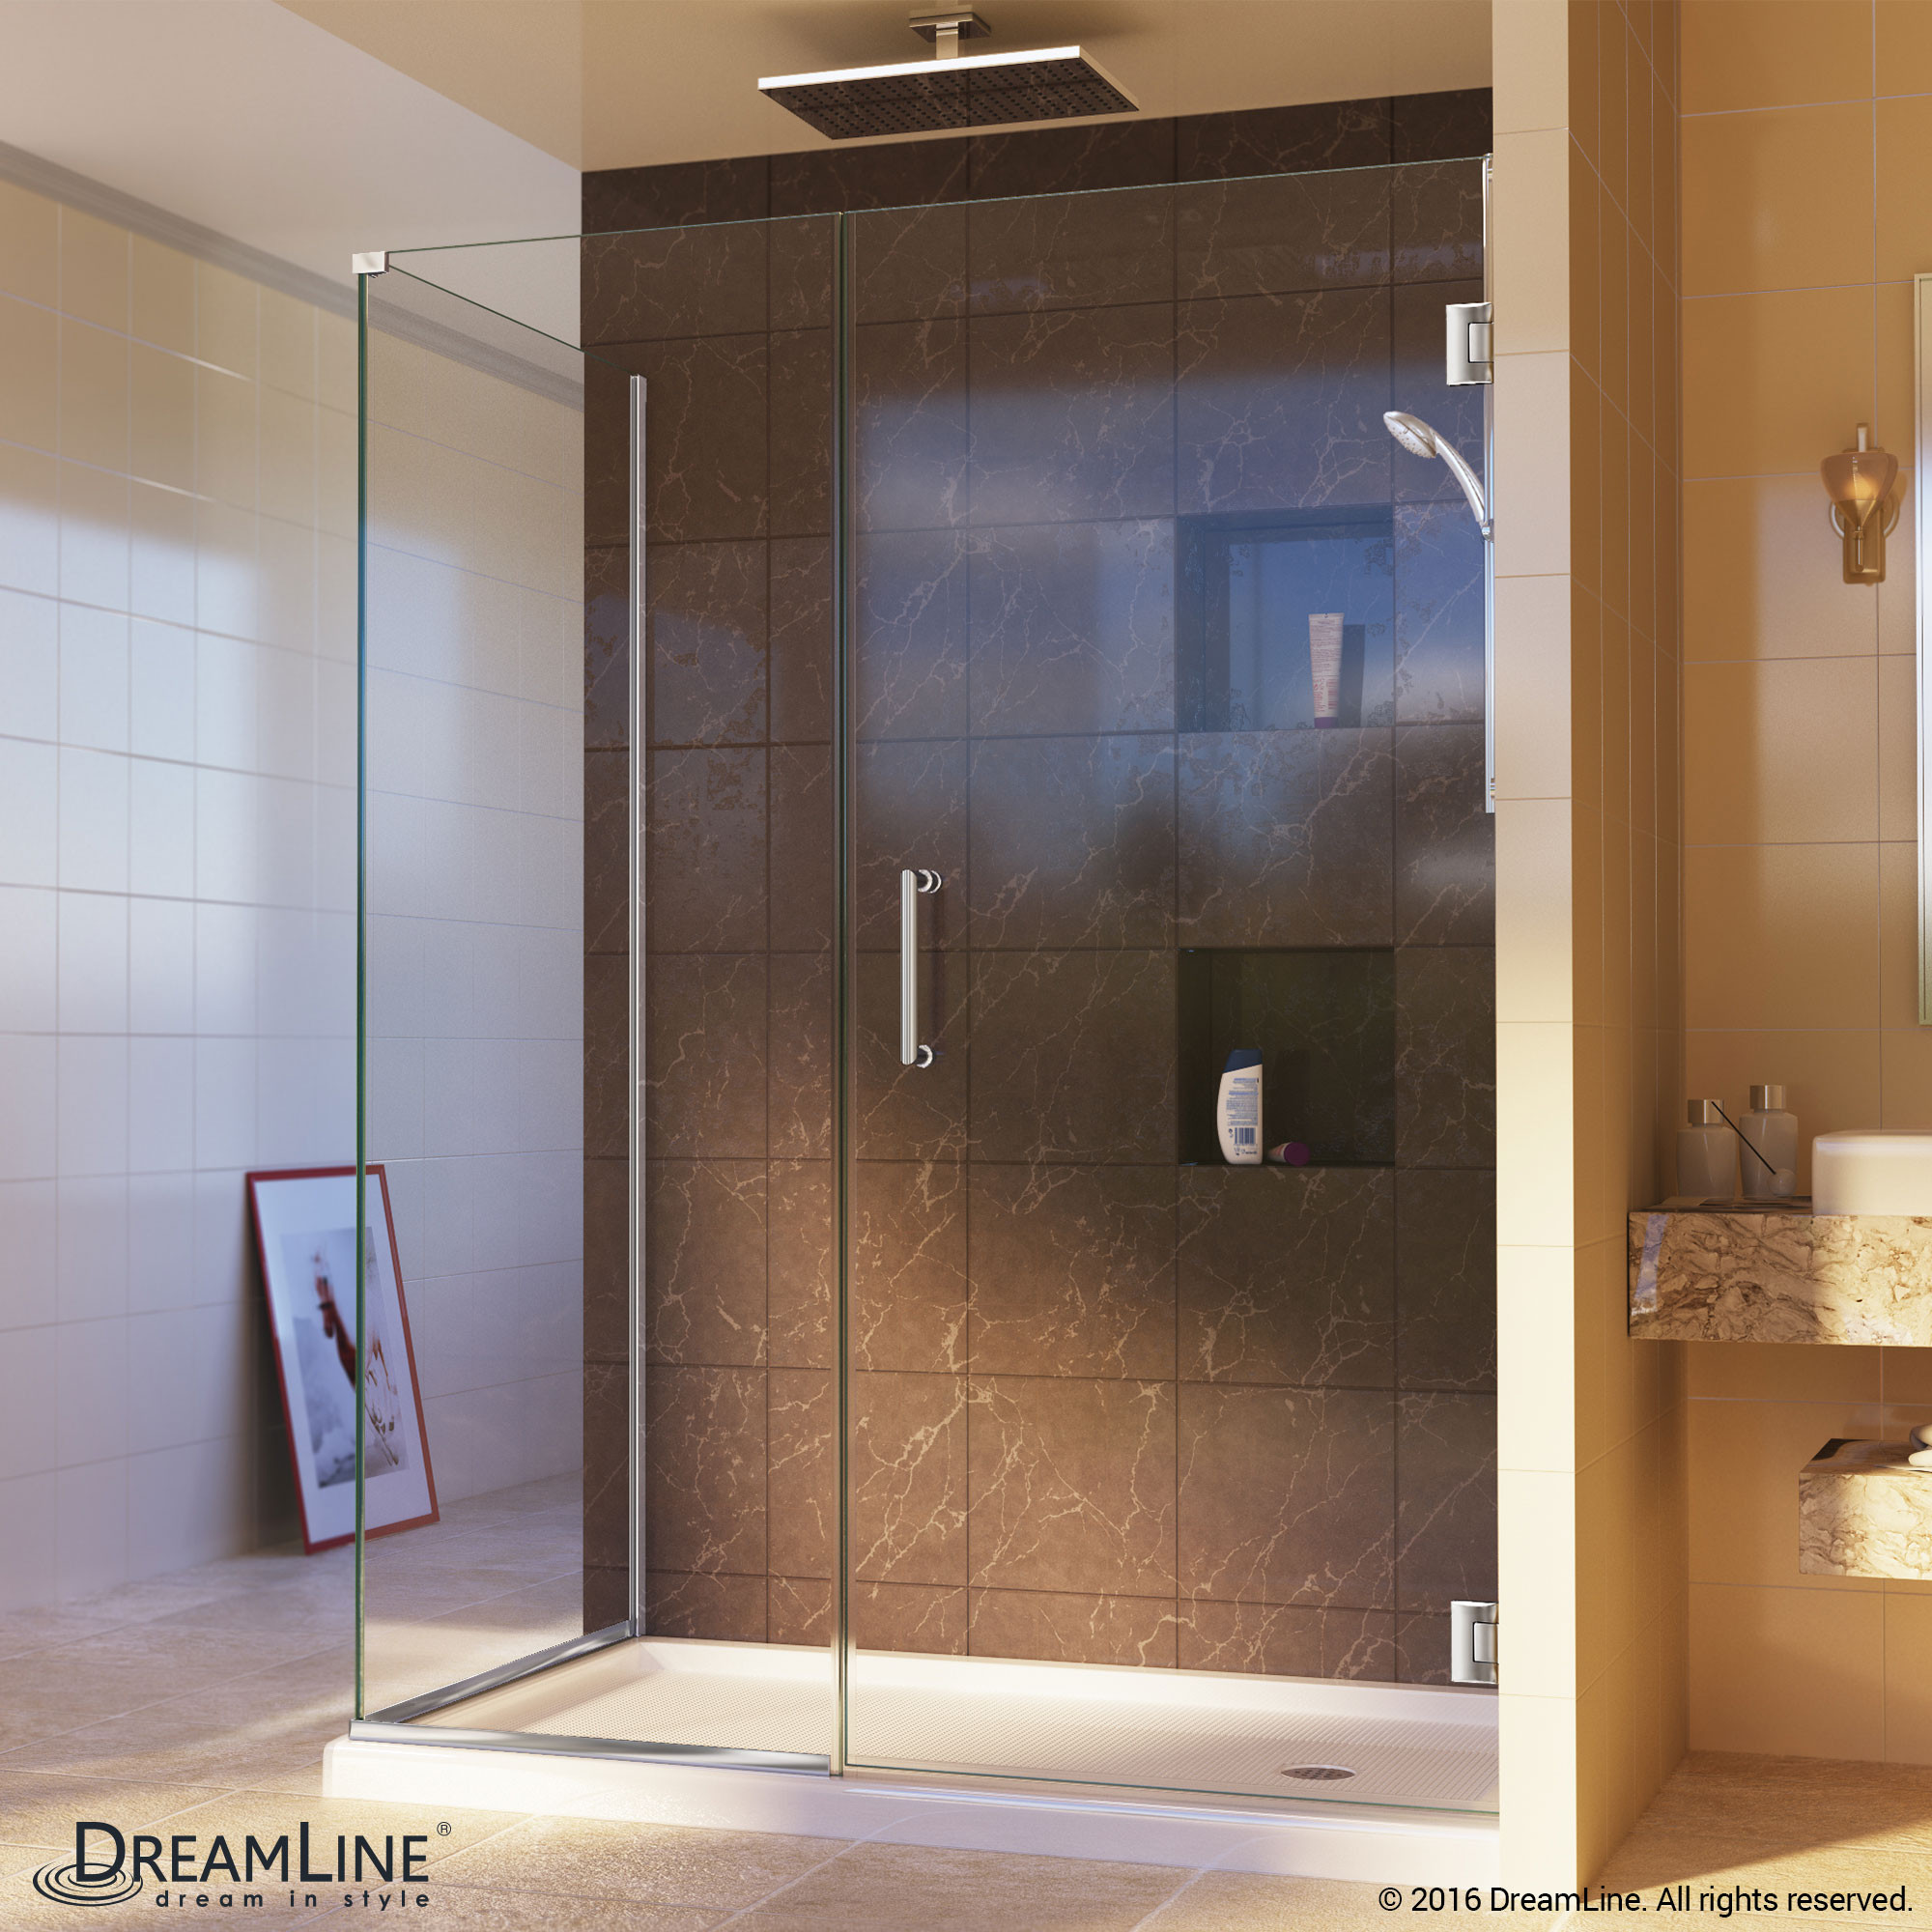 DreamLine SHEN-24480300-01 Unidoor Plus Hinged Shower Enclosure In Chrome Finish Hardware